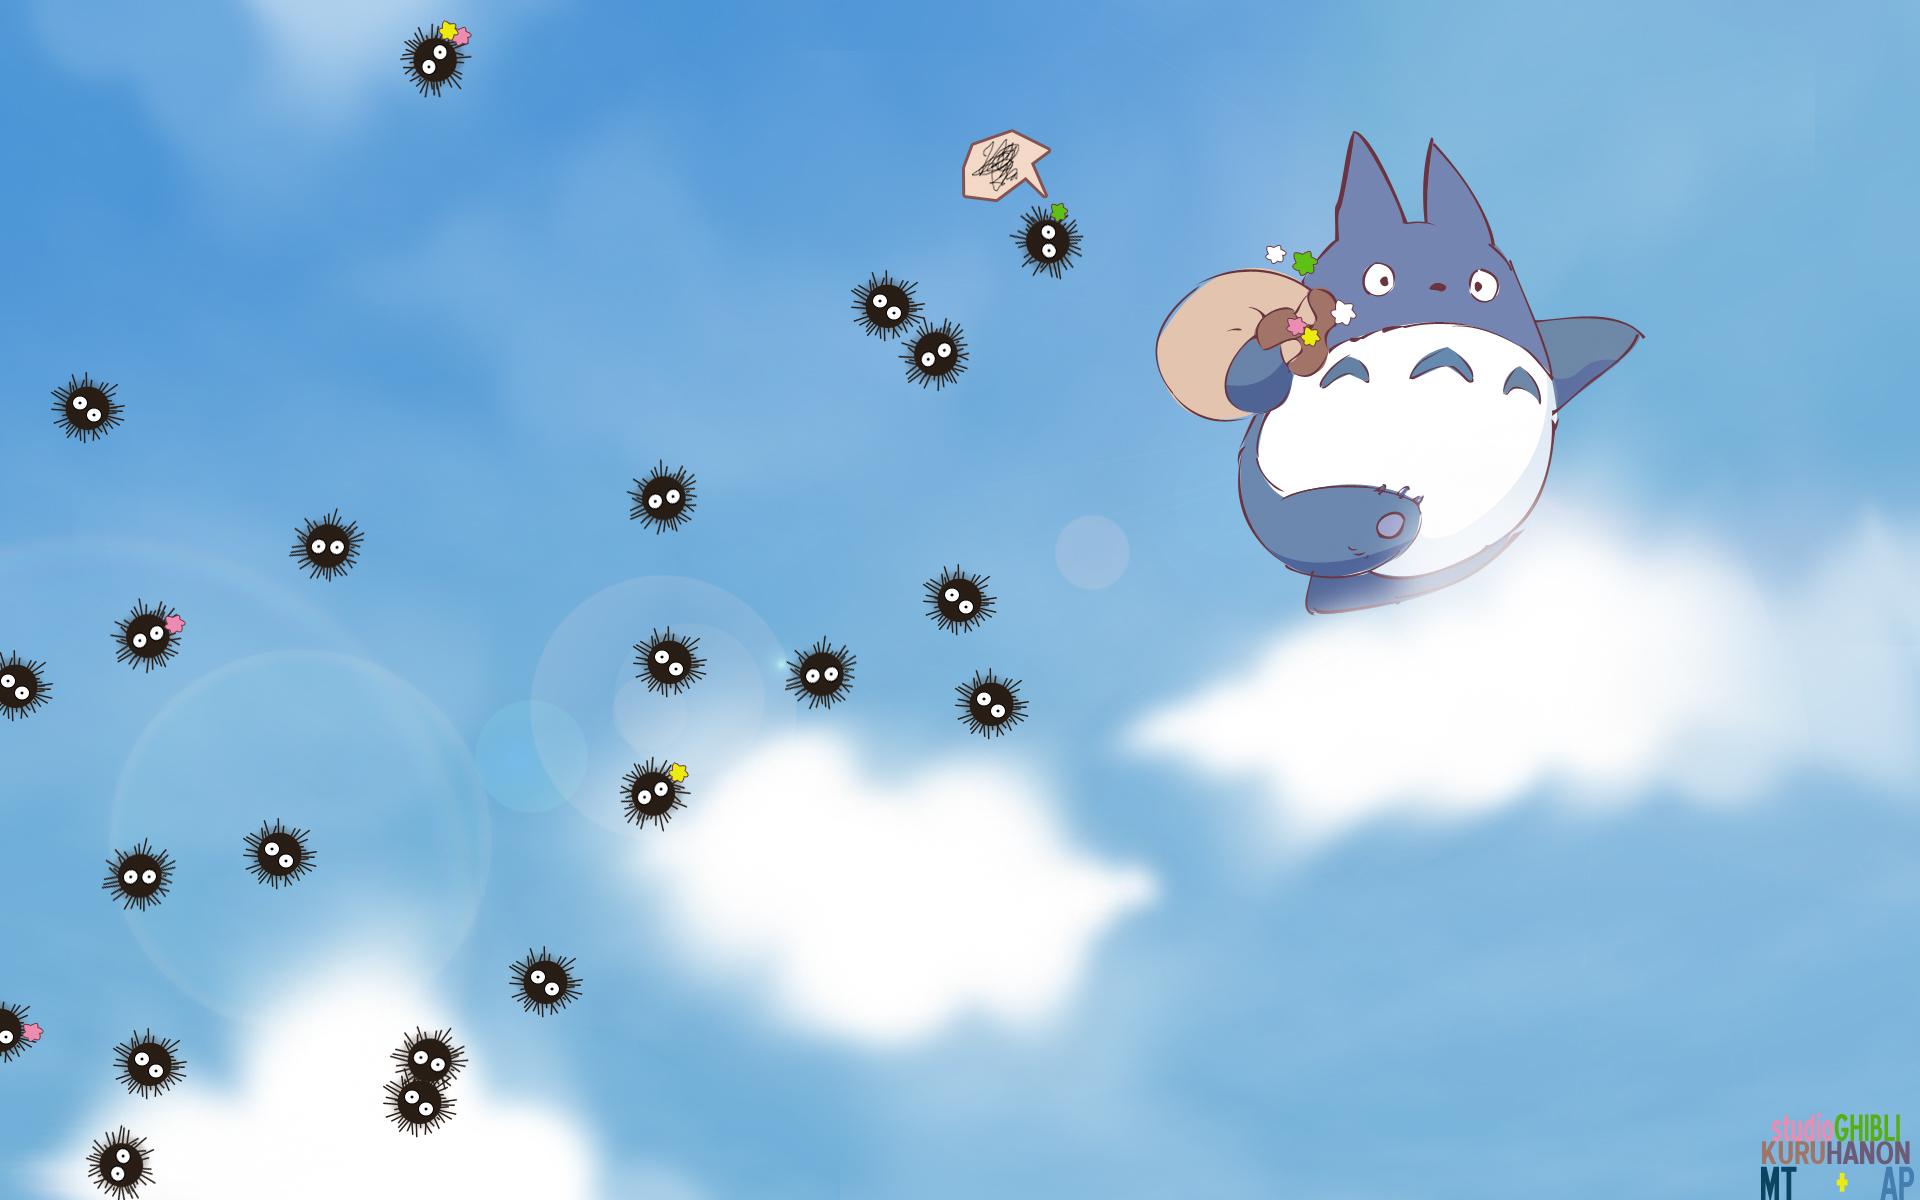 Soot Sprites - My Neighbor Totoro Photo (33302210) - Fanpop